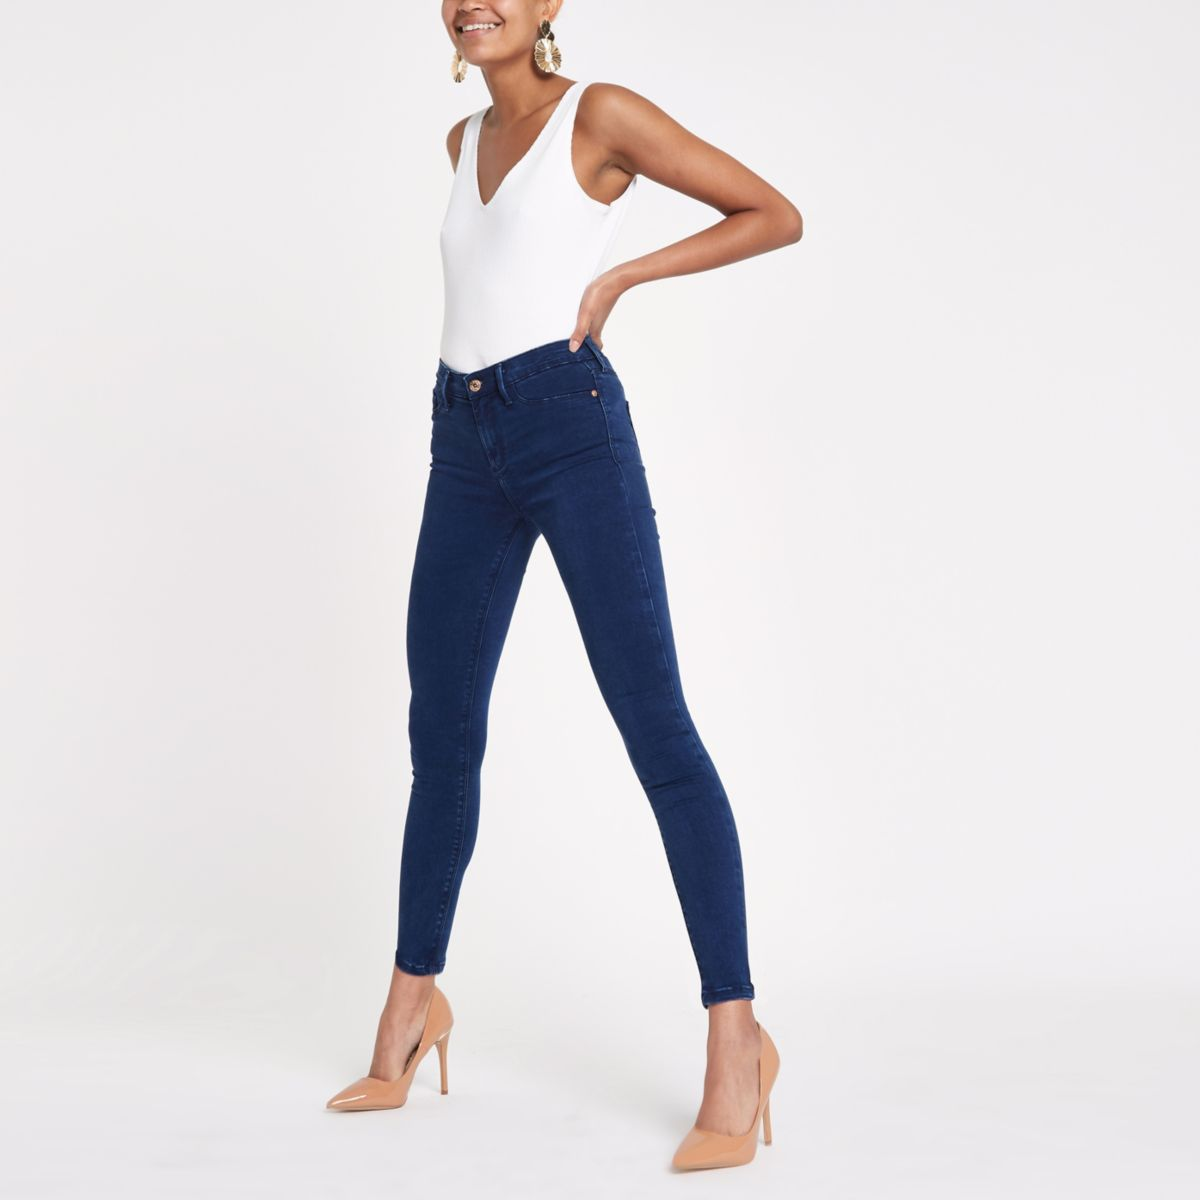 Molly - Donkerblauwe skinny-fit legging